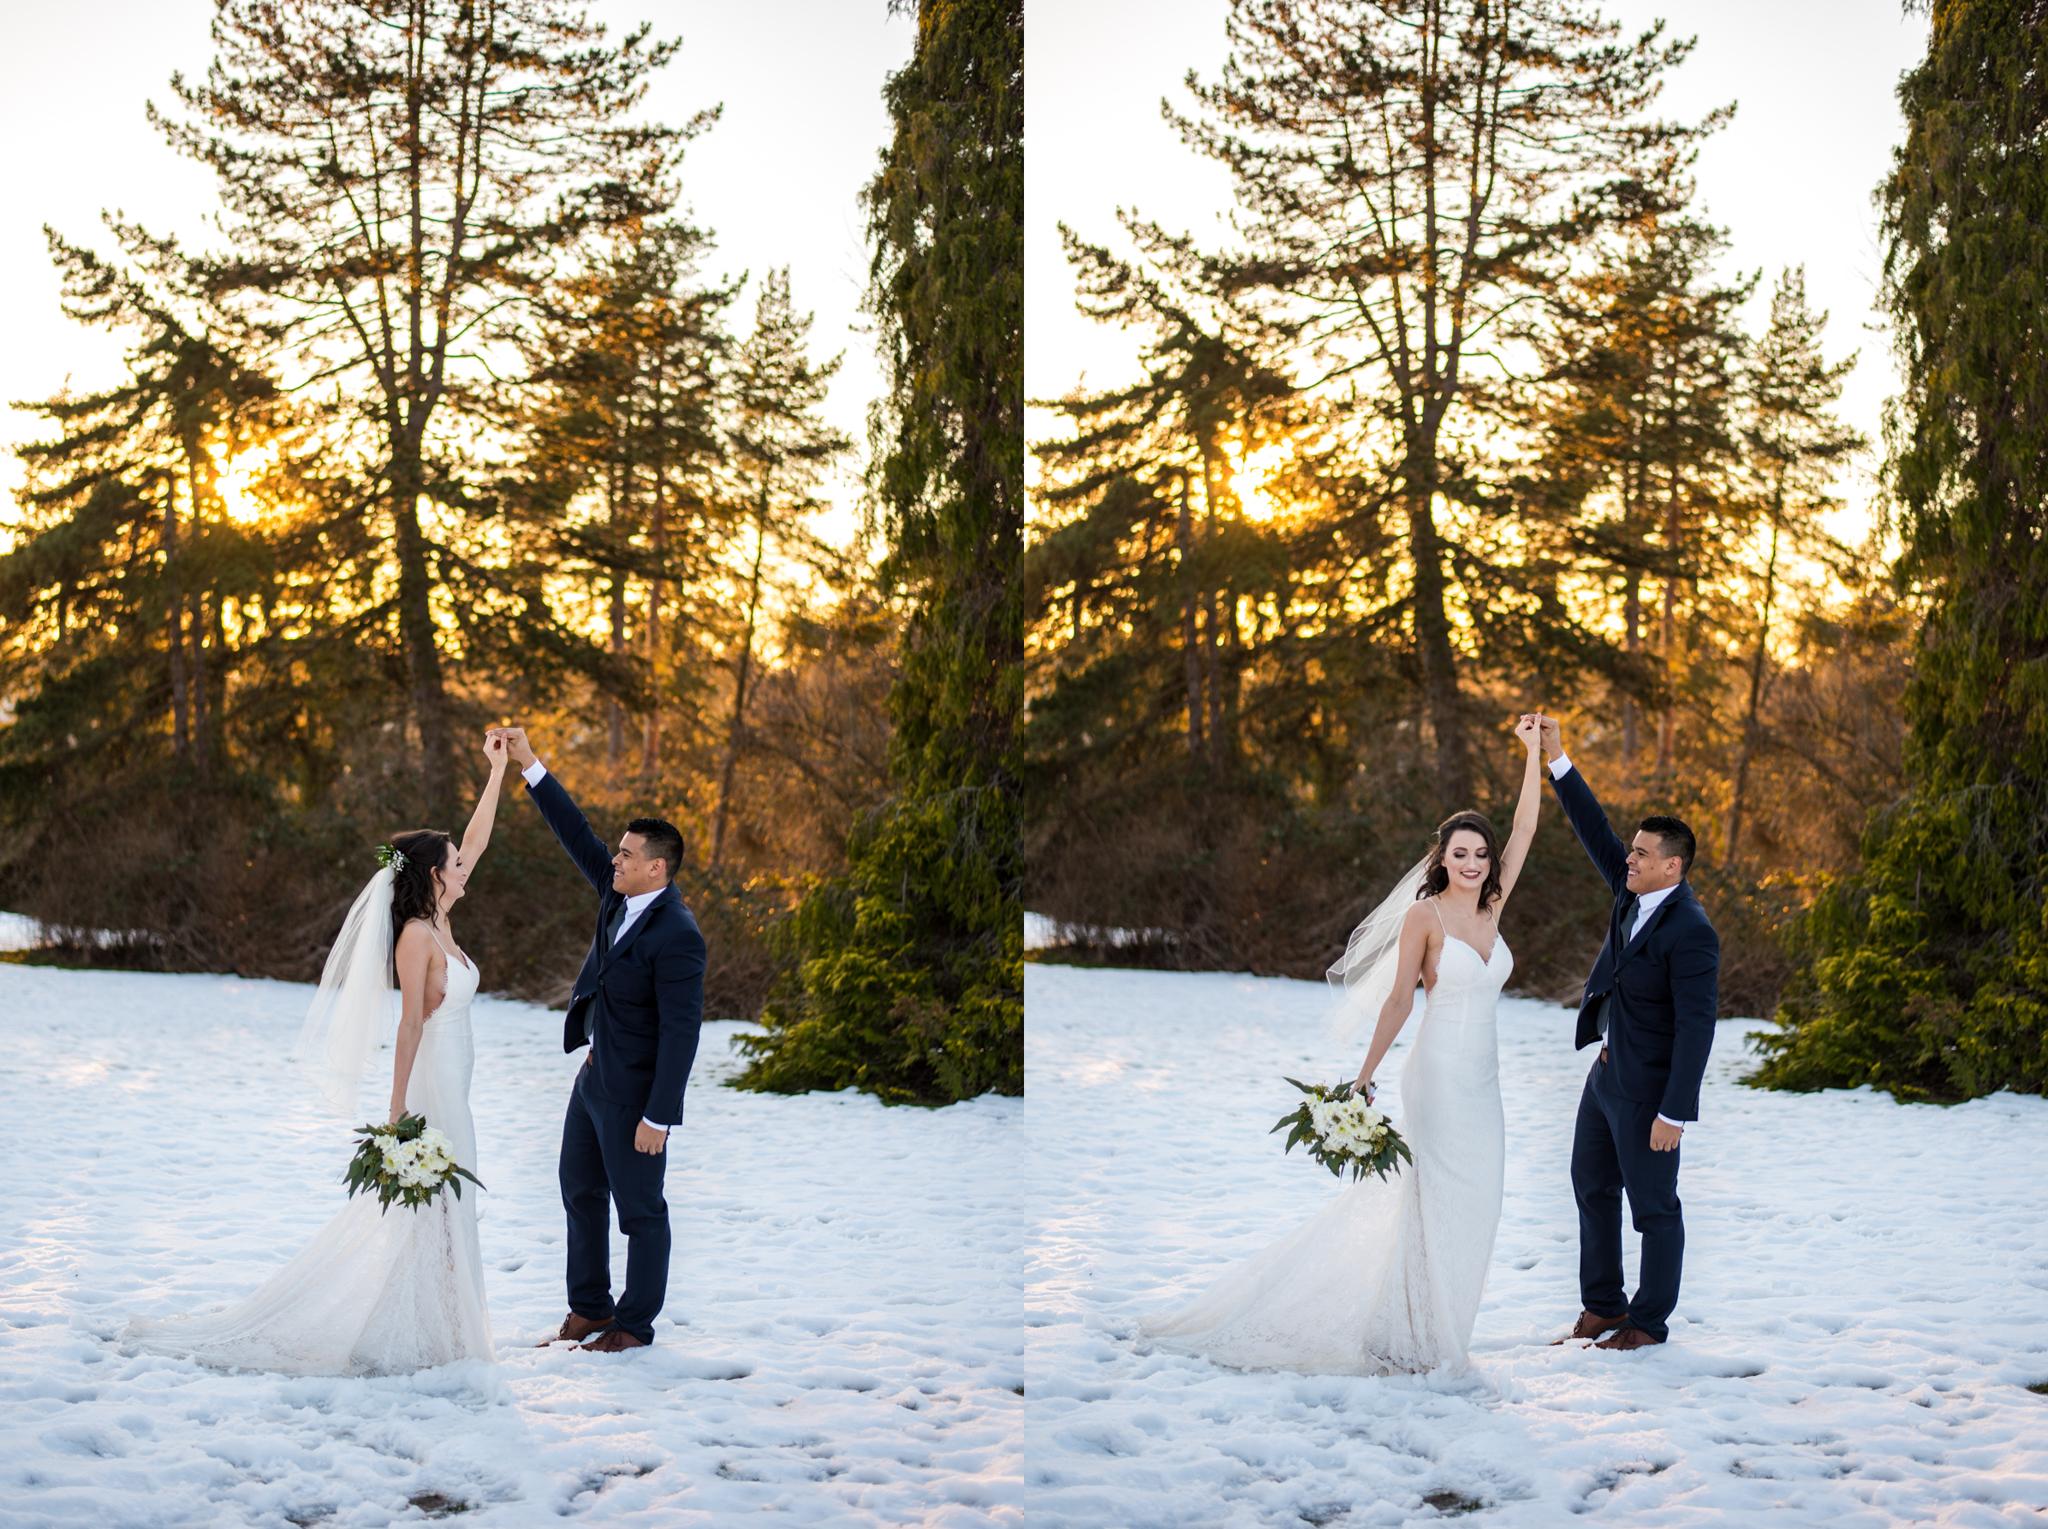 Bride and Groom in Queen Elizabeth Park in the snow